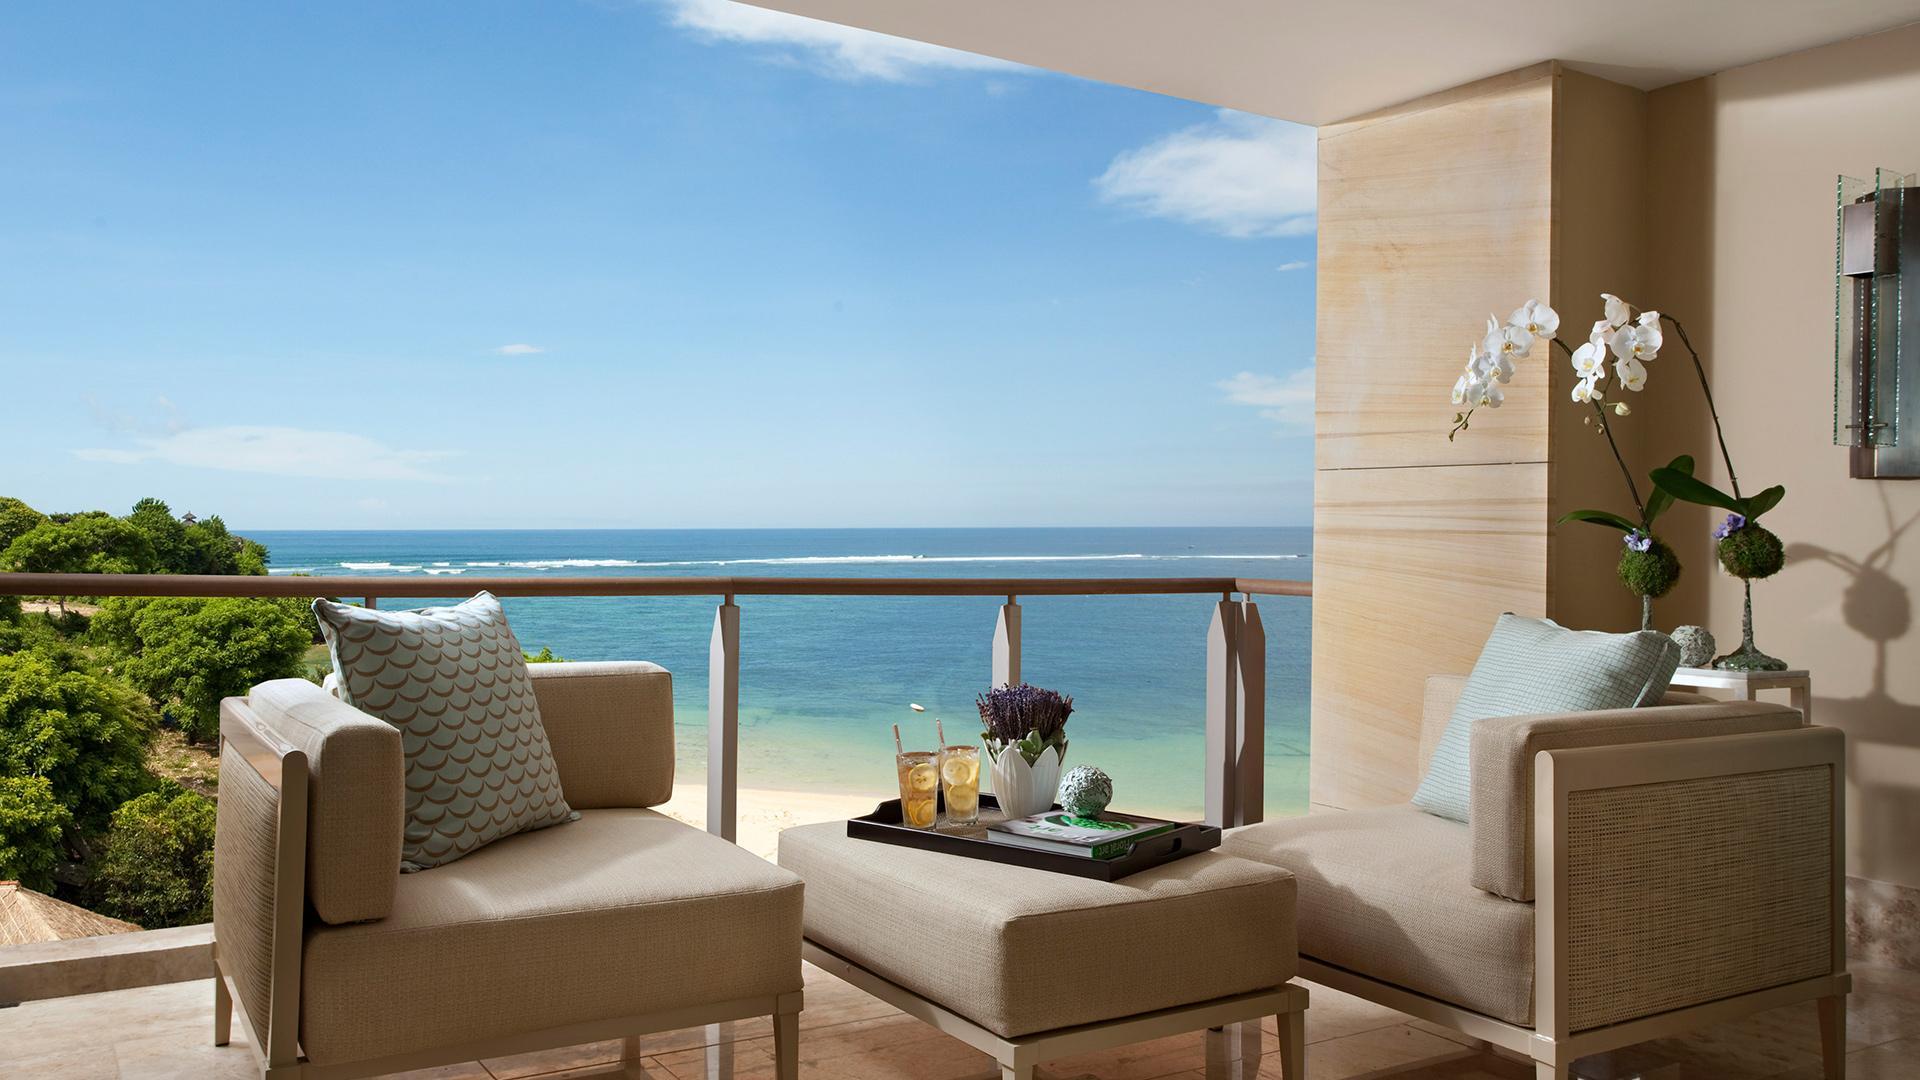 Royal Suite Ocean Court image 1 at Mulia Resort May 2021 by Kabupaten Badung, Bali, Indonesia